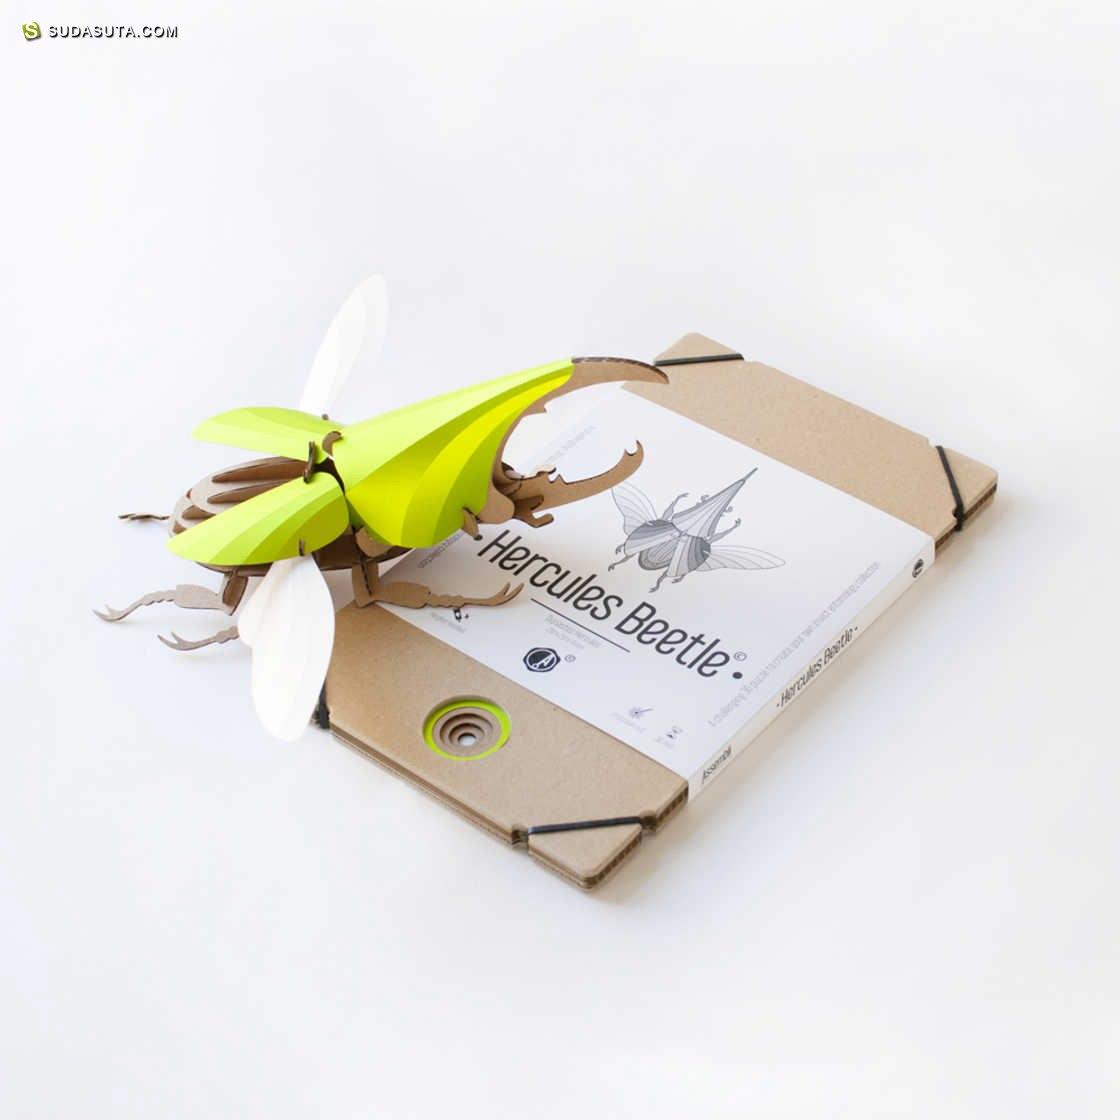 Joop Bource 有趣的纸张甲壳虫